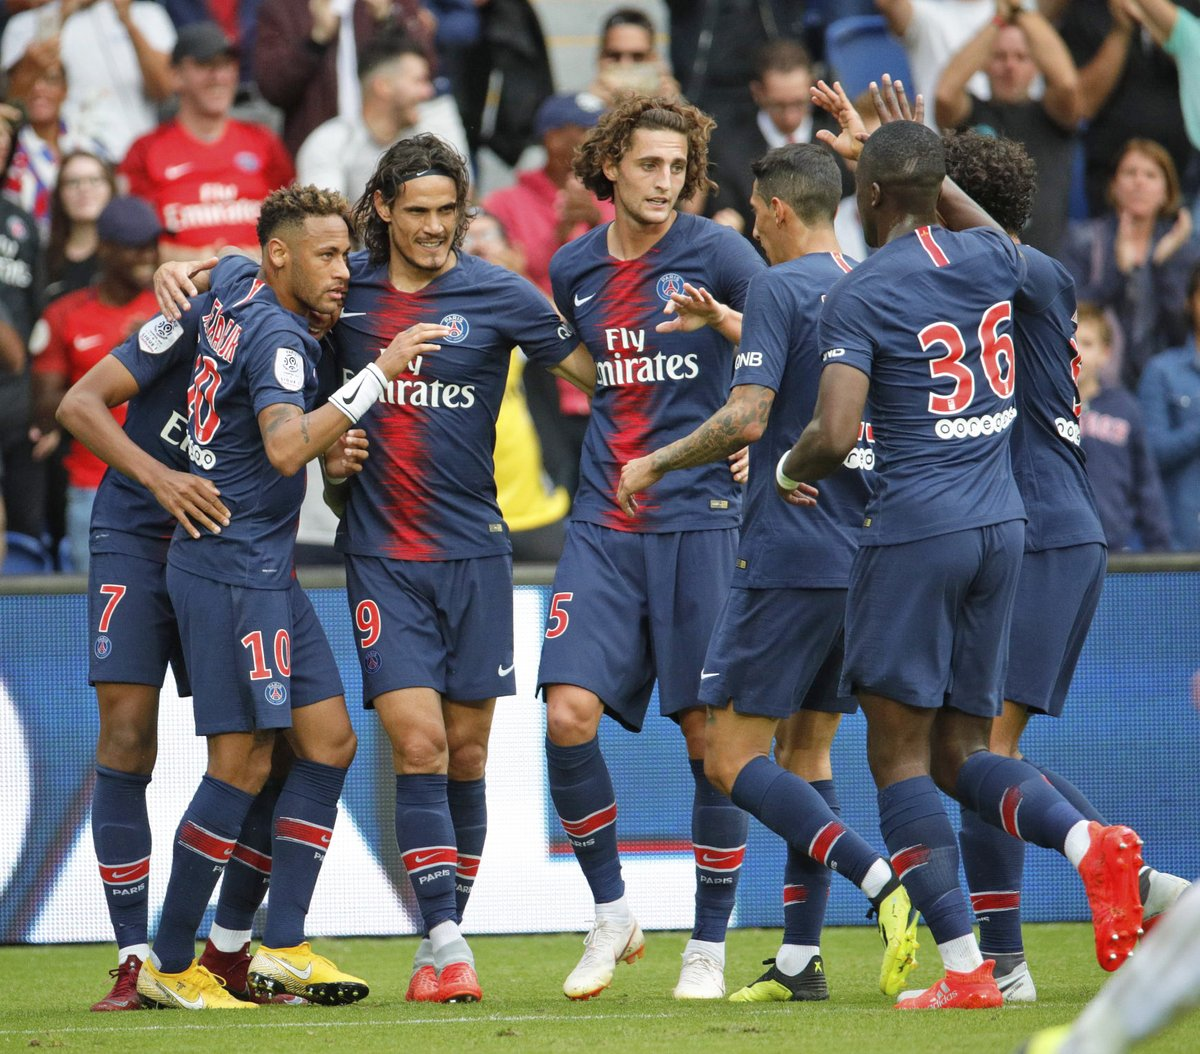 PSG巴黎聖日耳曼是法甲豪門俱樂部,巴西超級前鋒內馬爾(Neymar )是陣中招牌球星,近年PSG也不斷將版圖觸及電競產業。